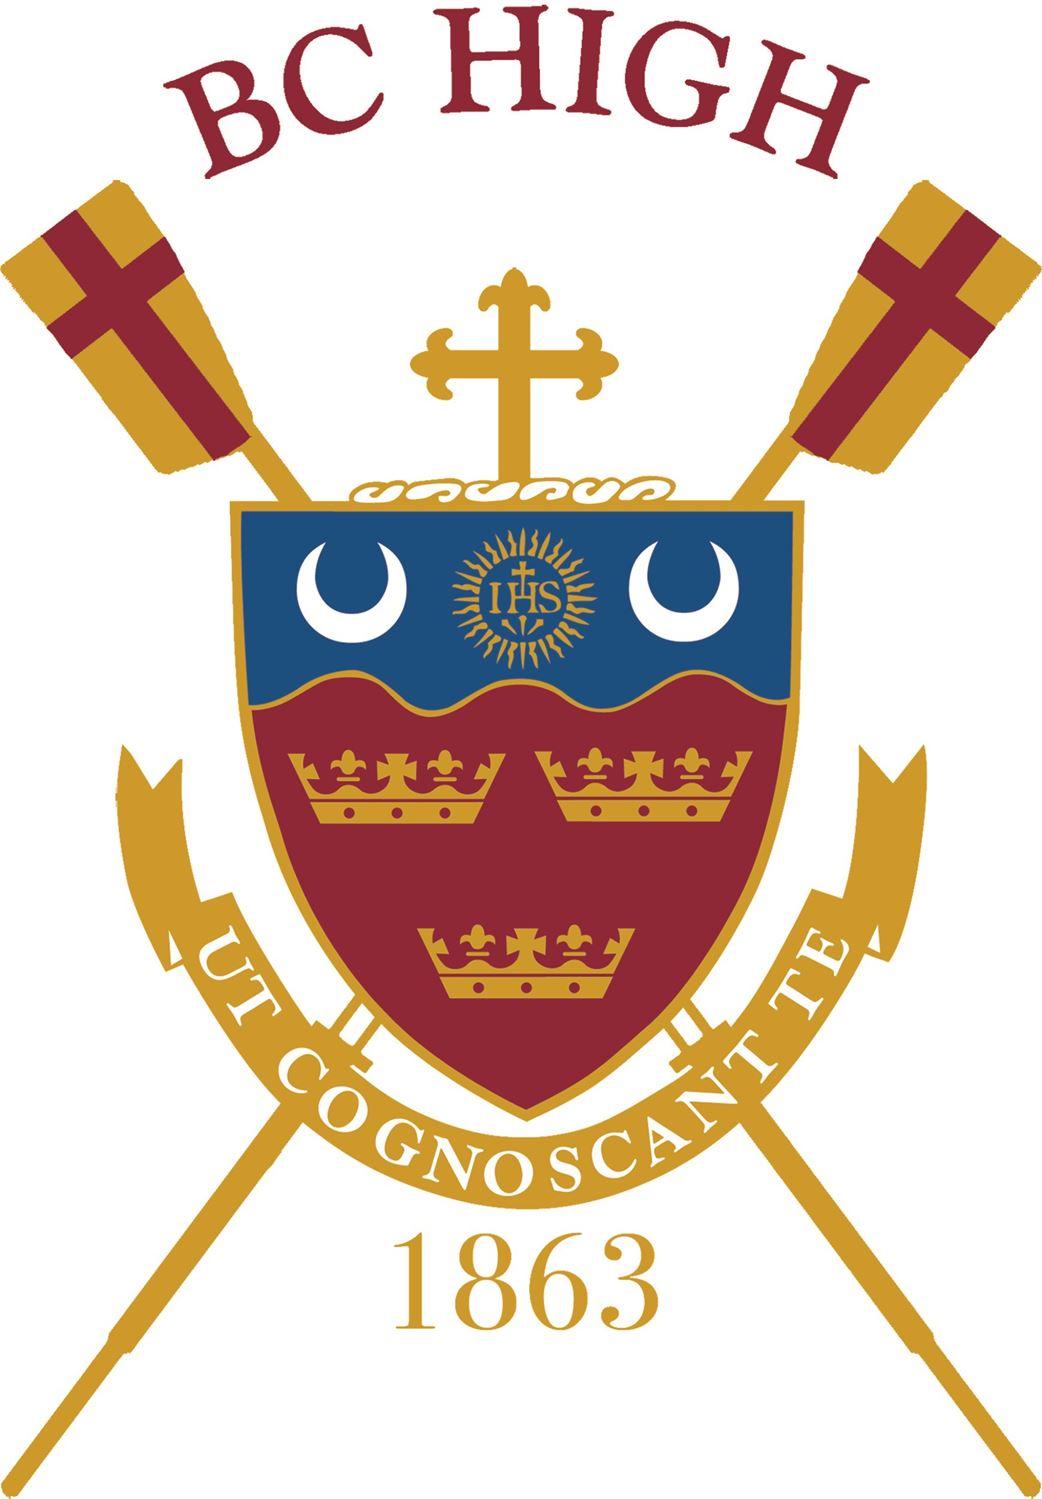 Boston College High School - BCH Rowing